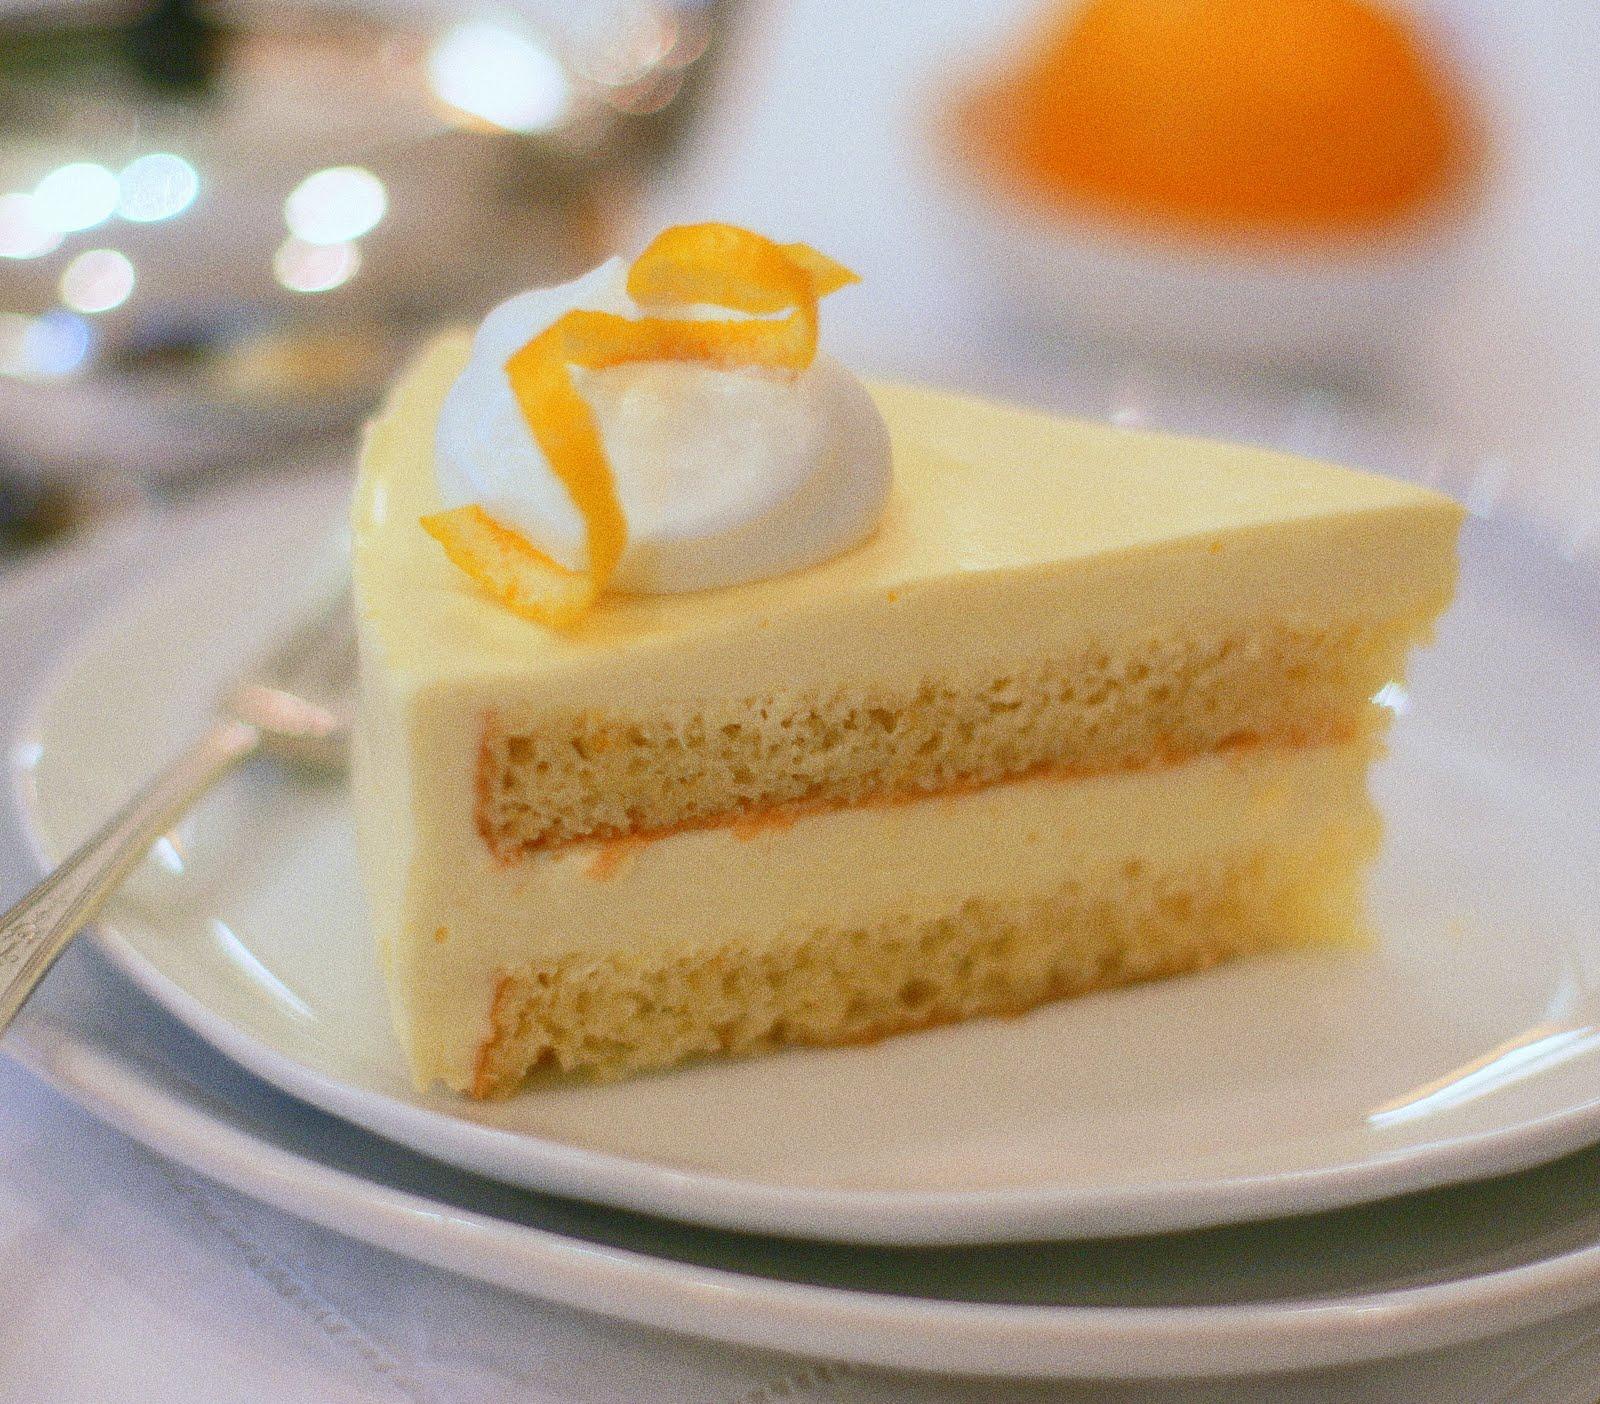 How to Make a Lemon Cake